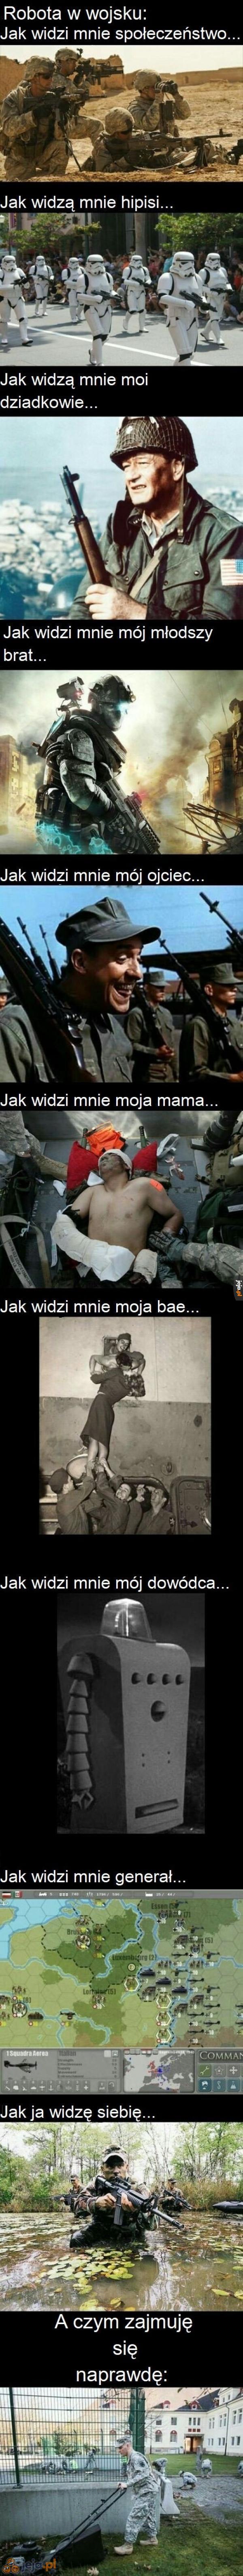 Realia pracy w armii